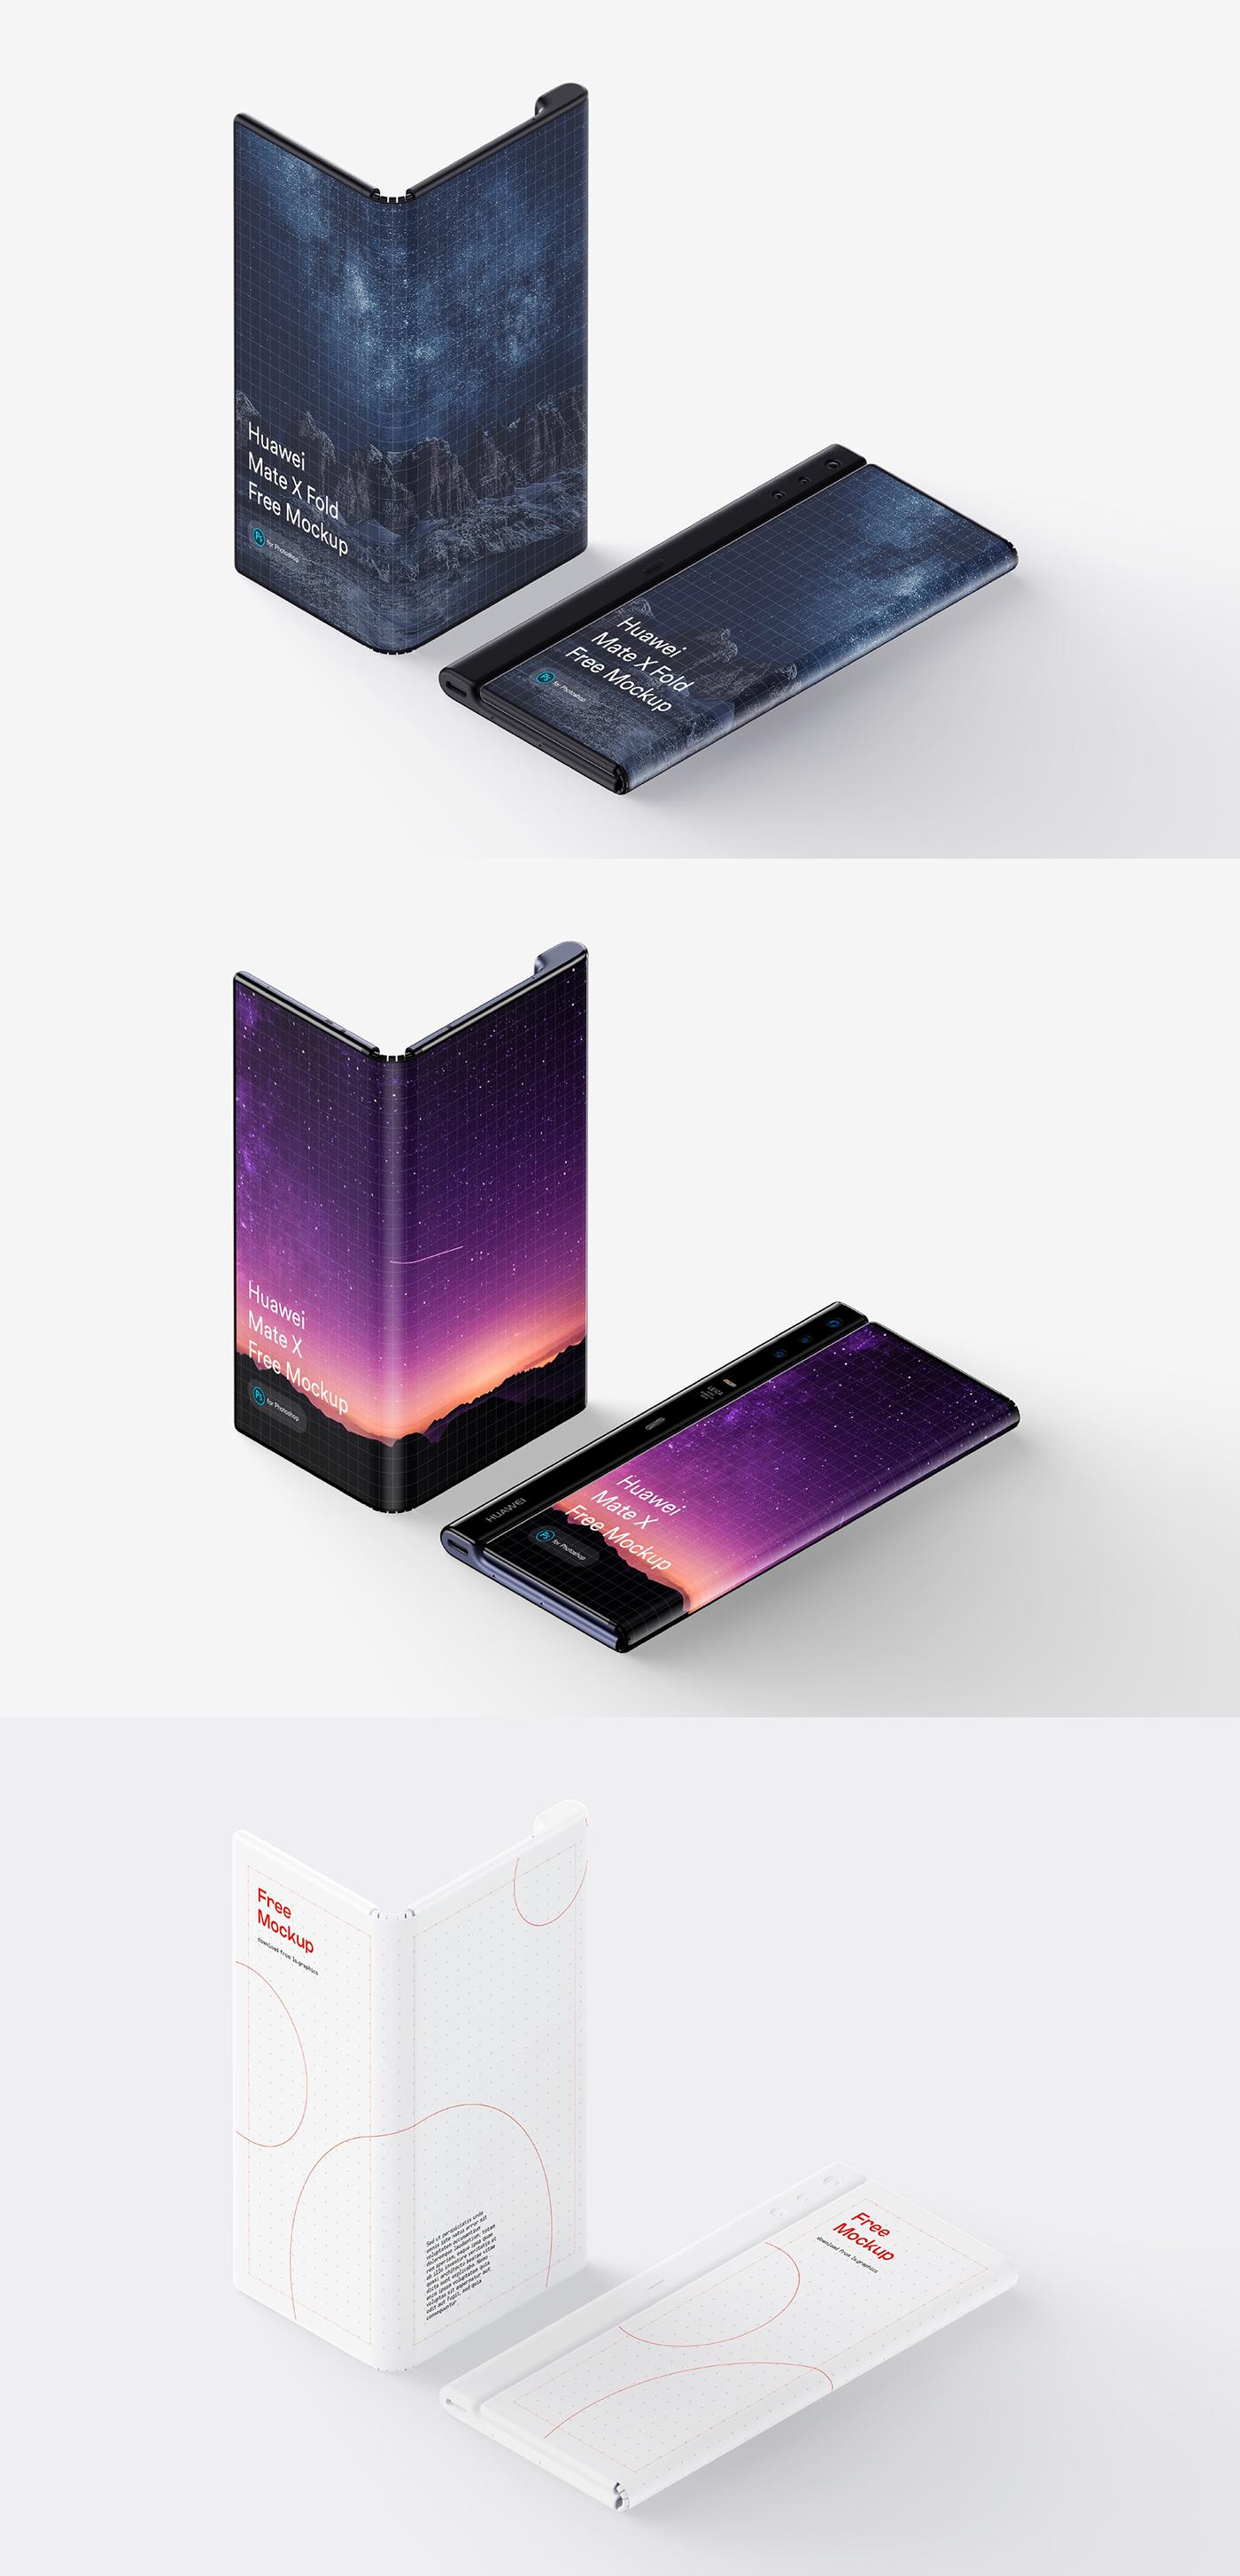 Mockup free freebie galaxy s10 mockup iphone x mockup pack mockup mock-up gradients